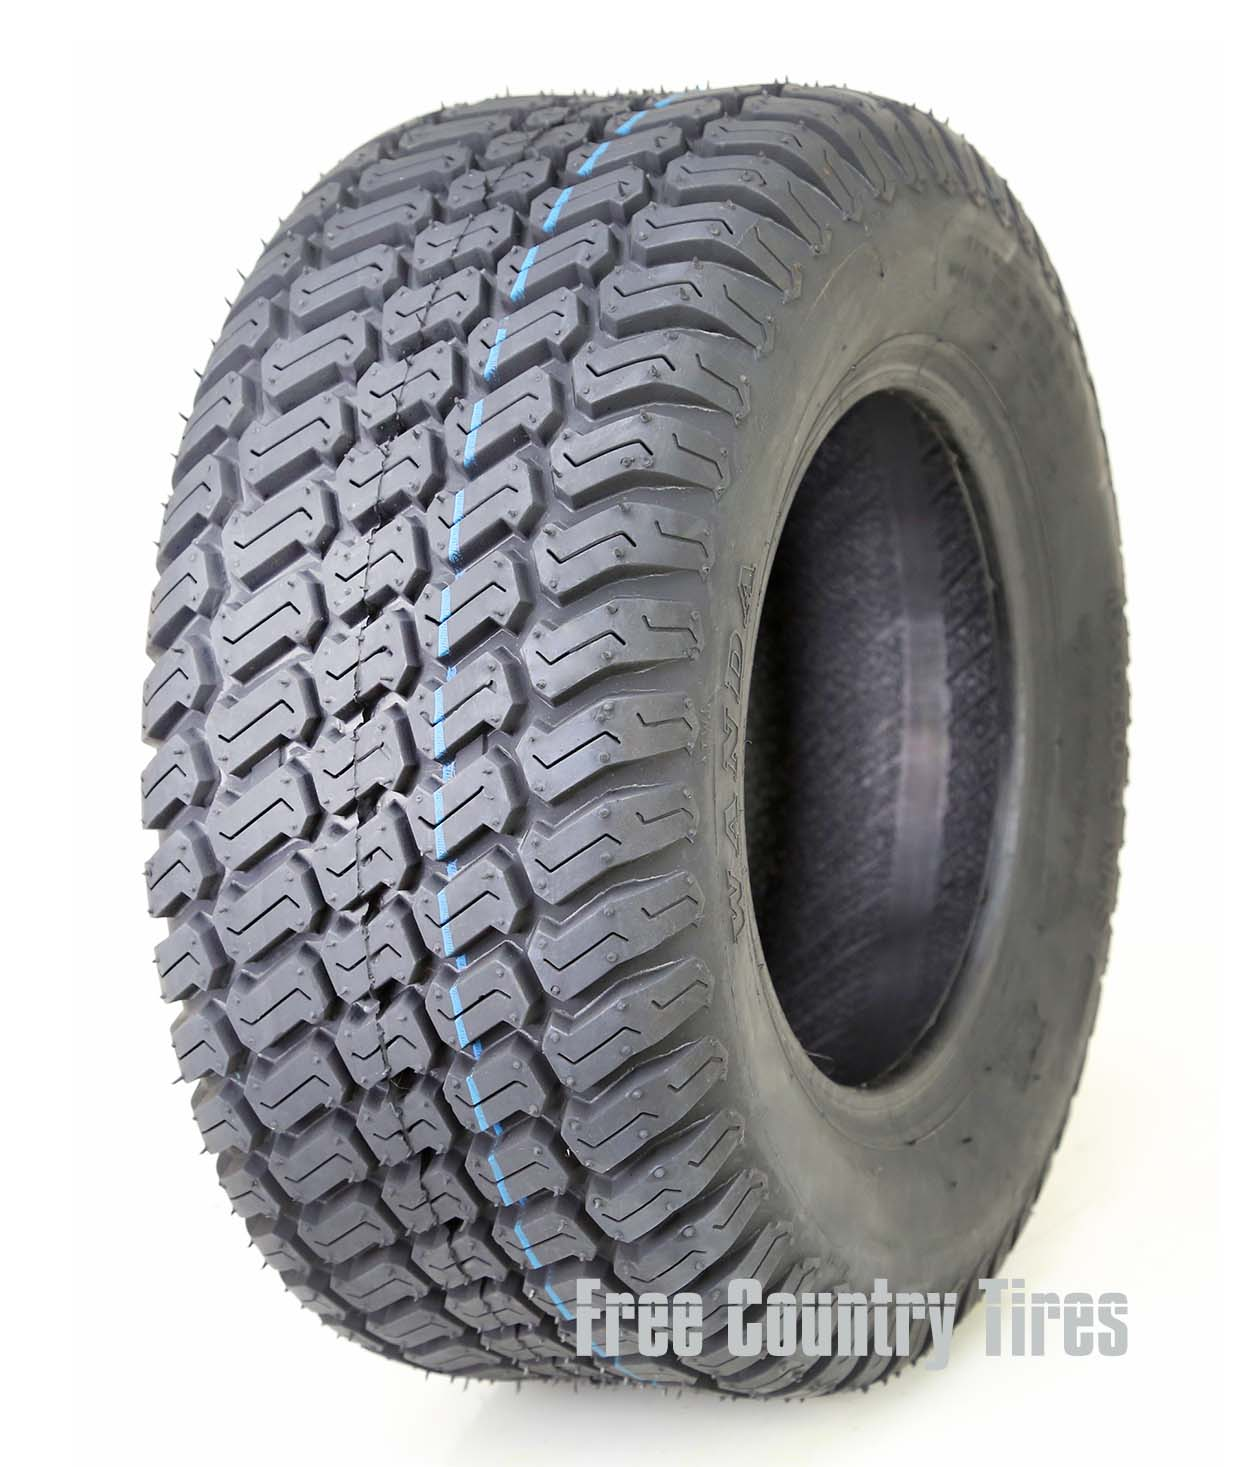 2 New 15x6.00-6  Lawn Mower Utility Cart Turf Tires P332 //4PR 13016